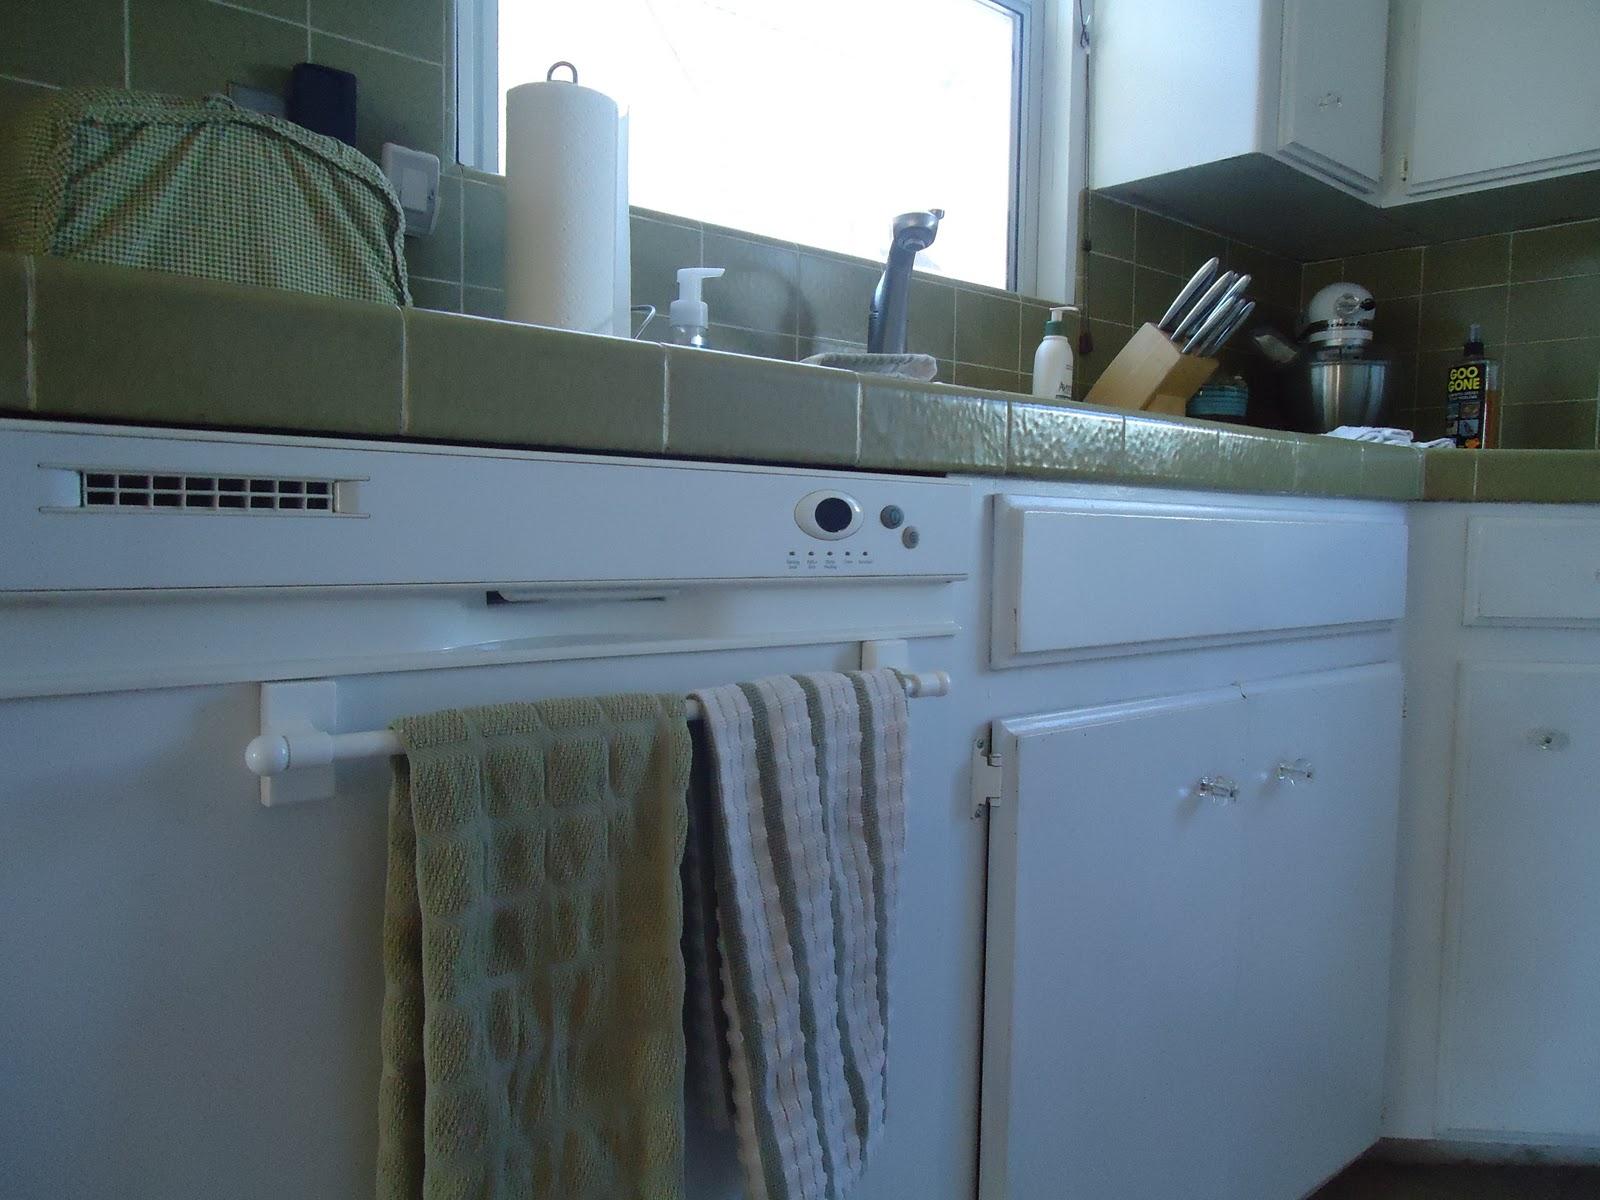 Where to put that towel bar... | Organizing Made Fun: Where to put ...